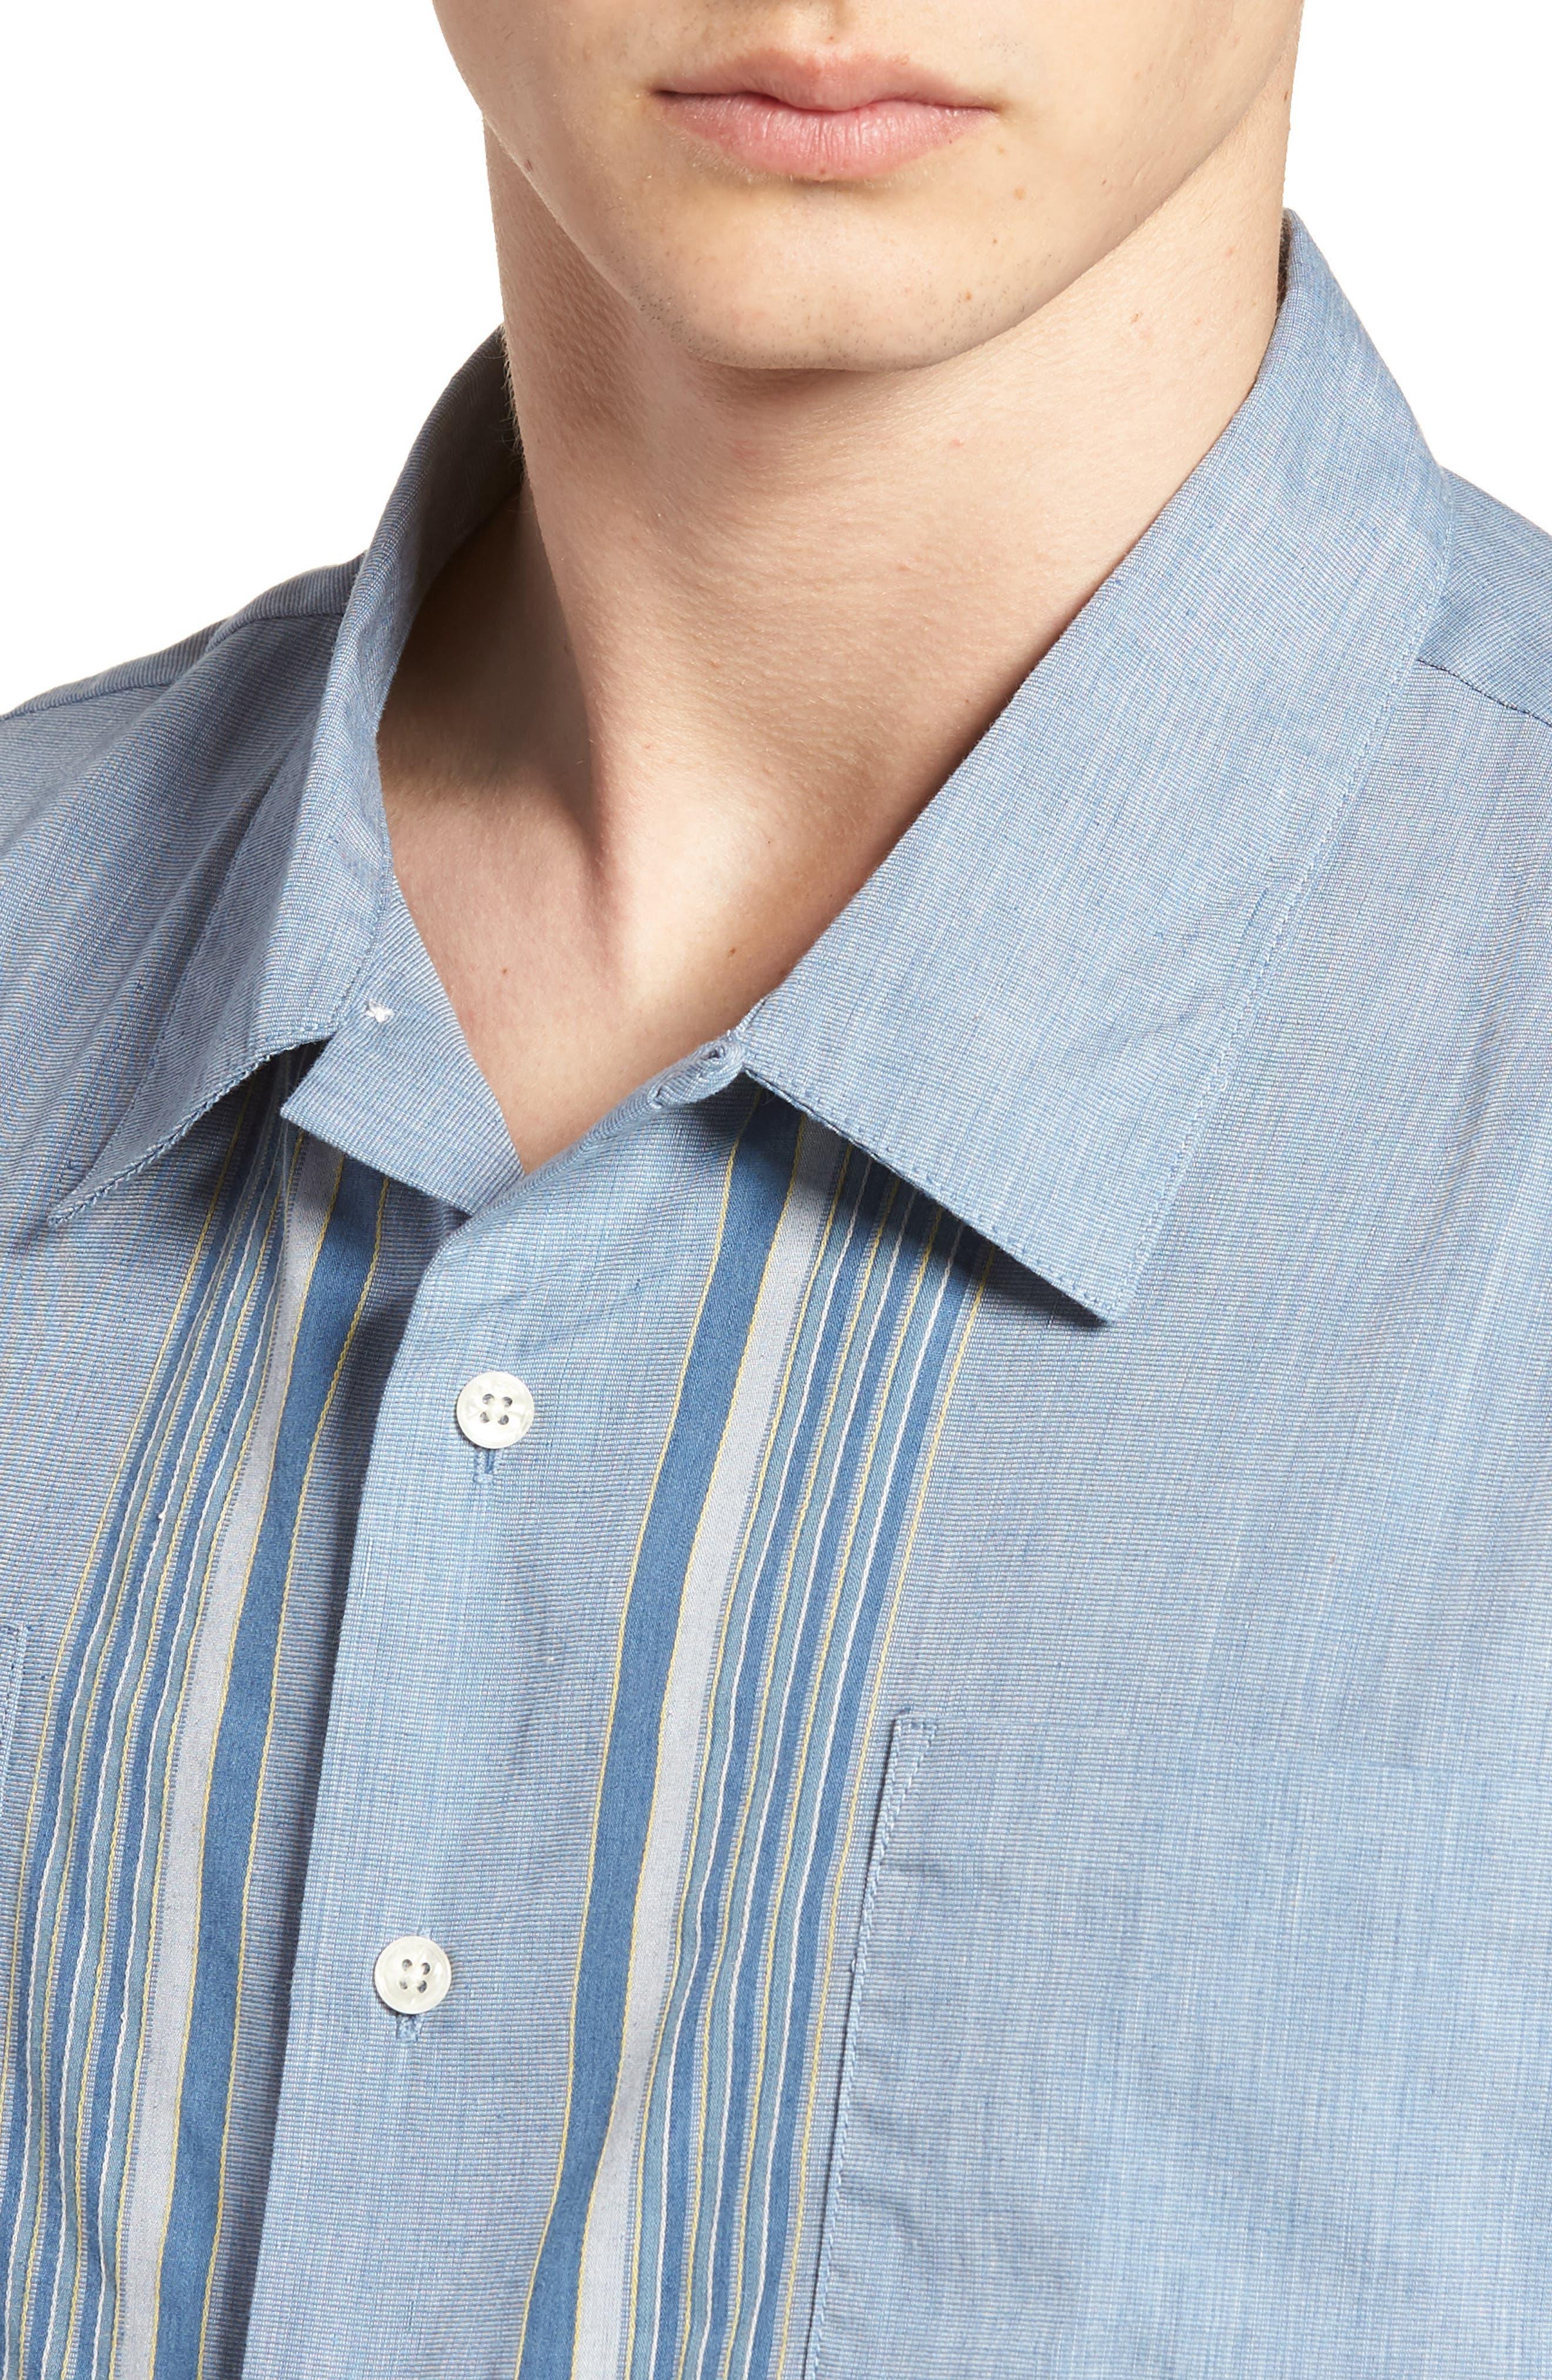 Cruze Woven Shirt,                             Alternate thumbnail 4, color,                             400